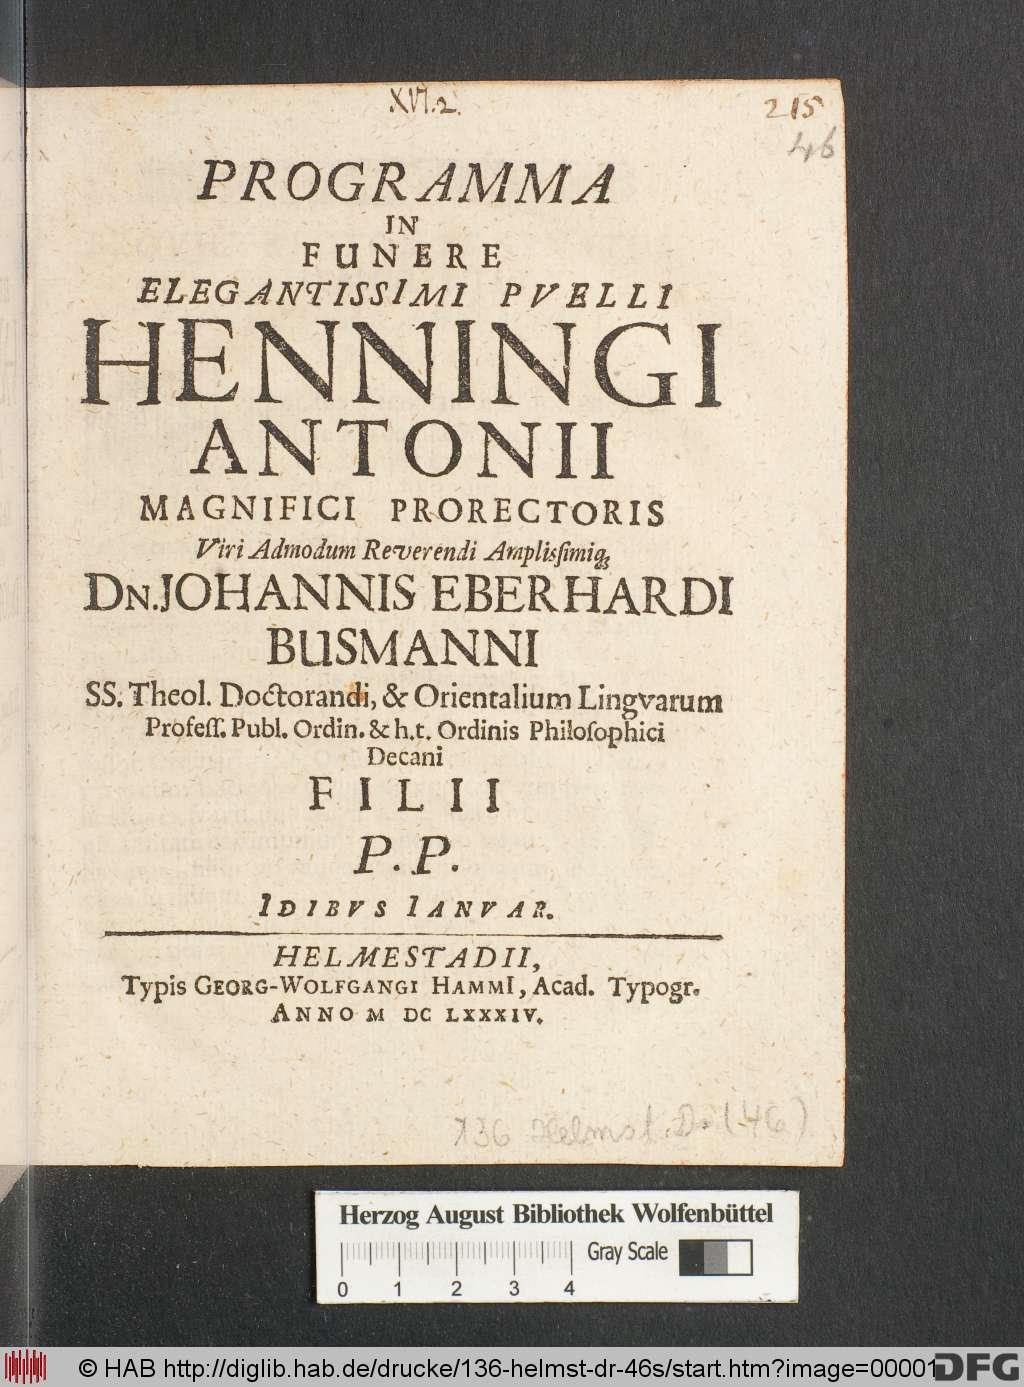 http://diglib.hab.de/drucke/136-helmst-dr-46s/00001.jpg